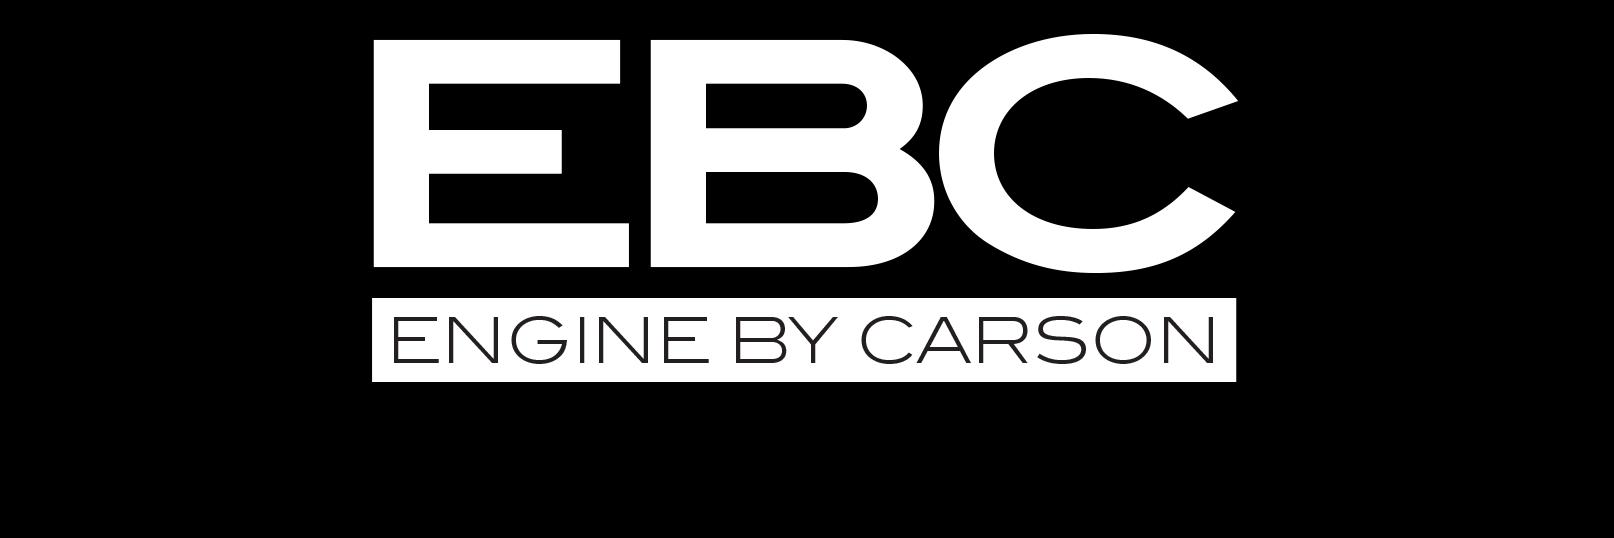 Engine By Carson - EBC